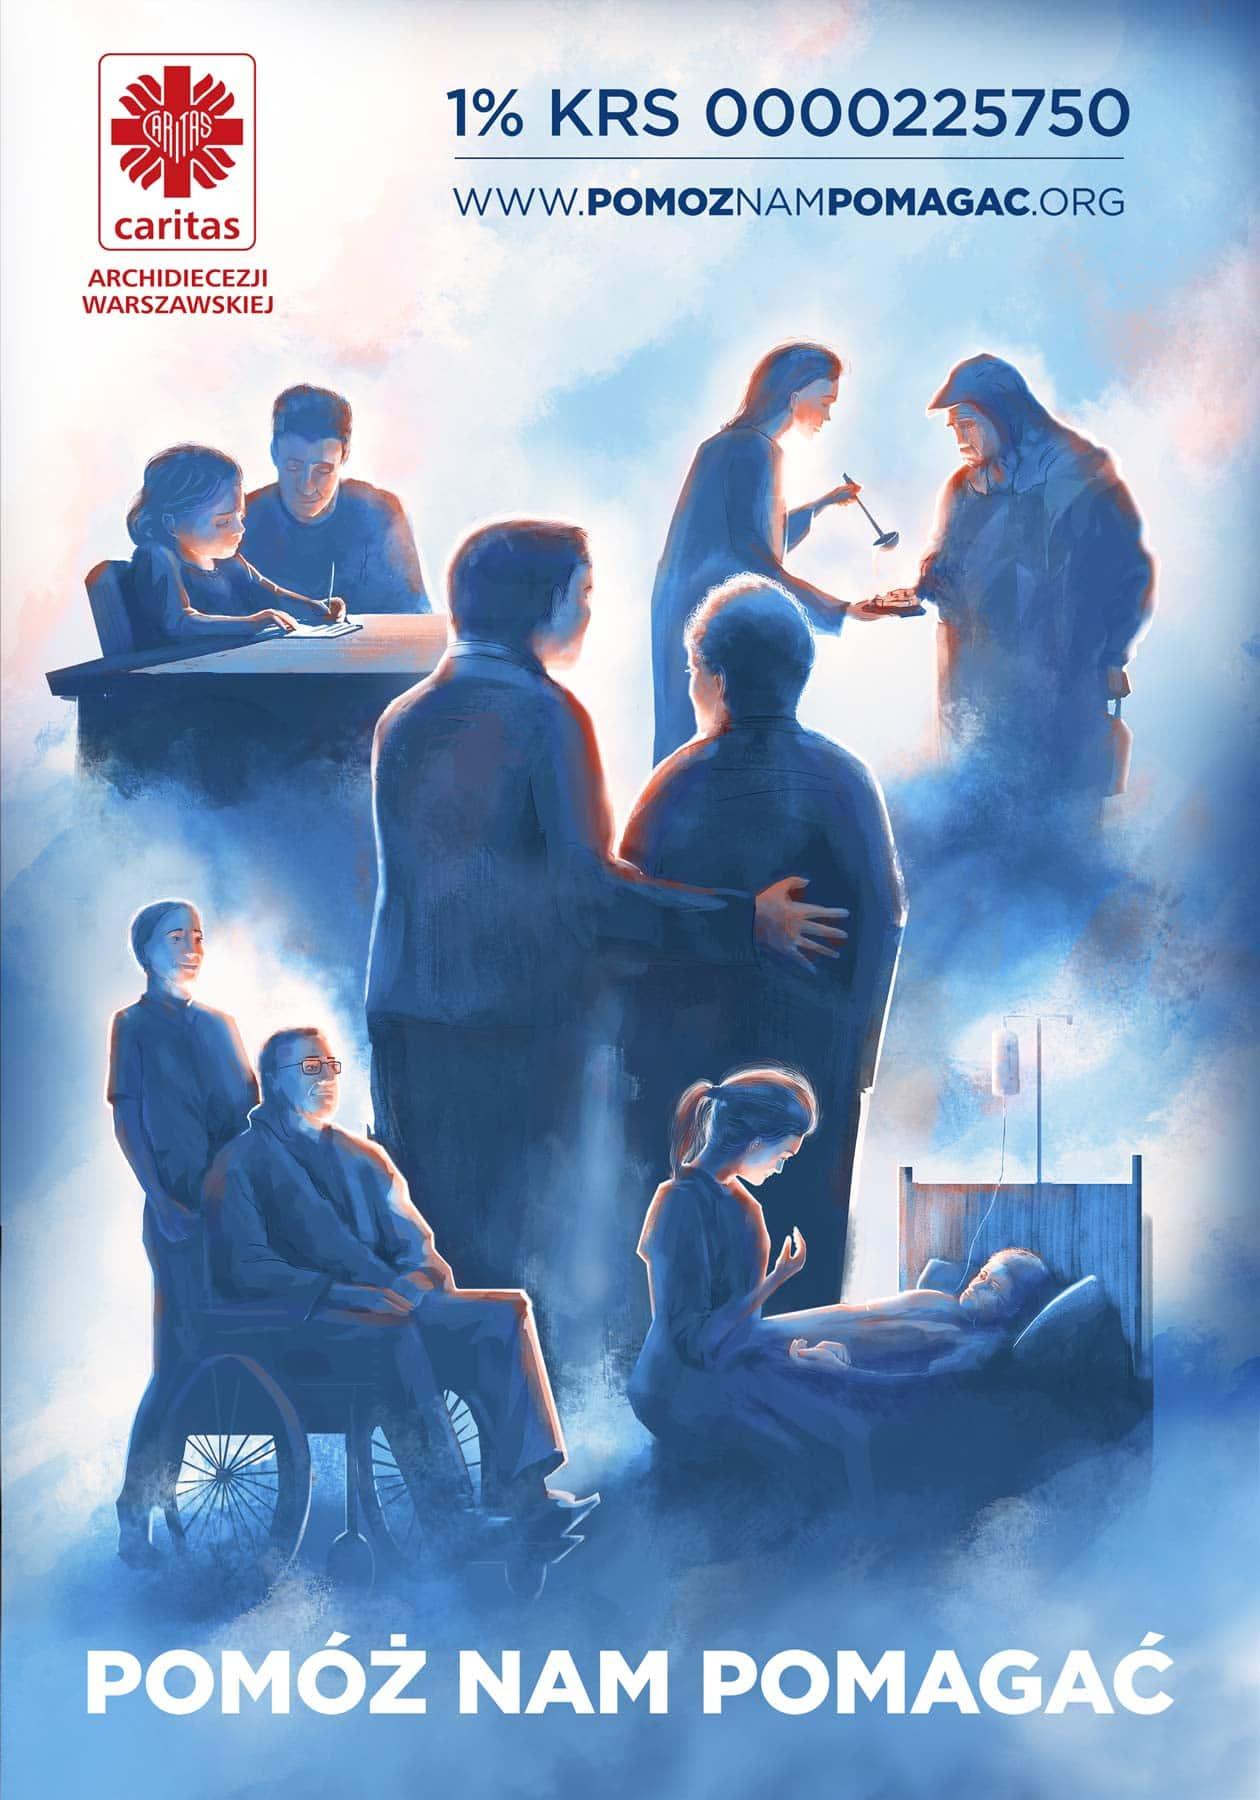 Help us to help - Caritas people in need of help poster illustration by Jakub Cichecki